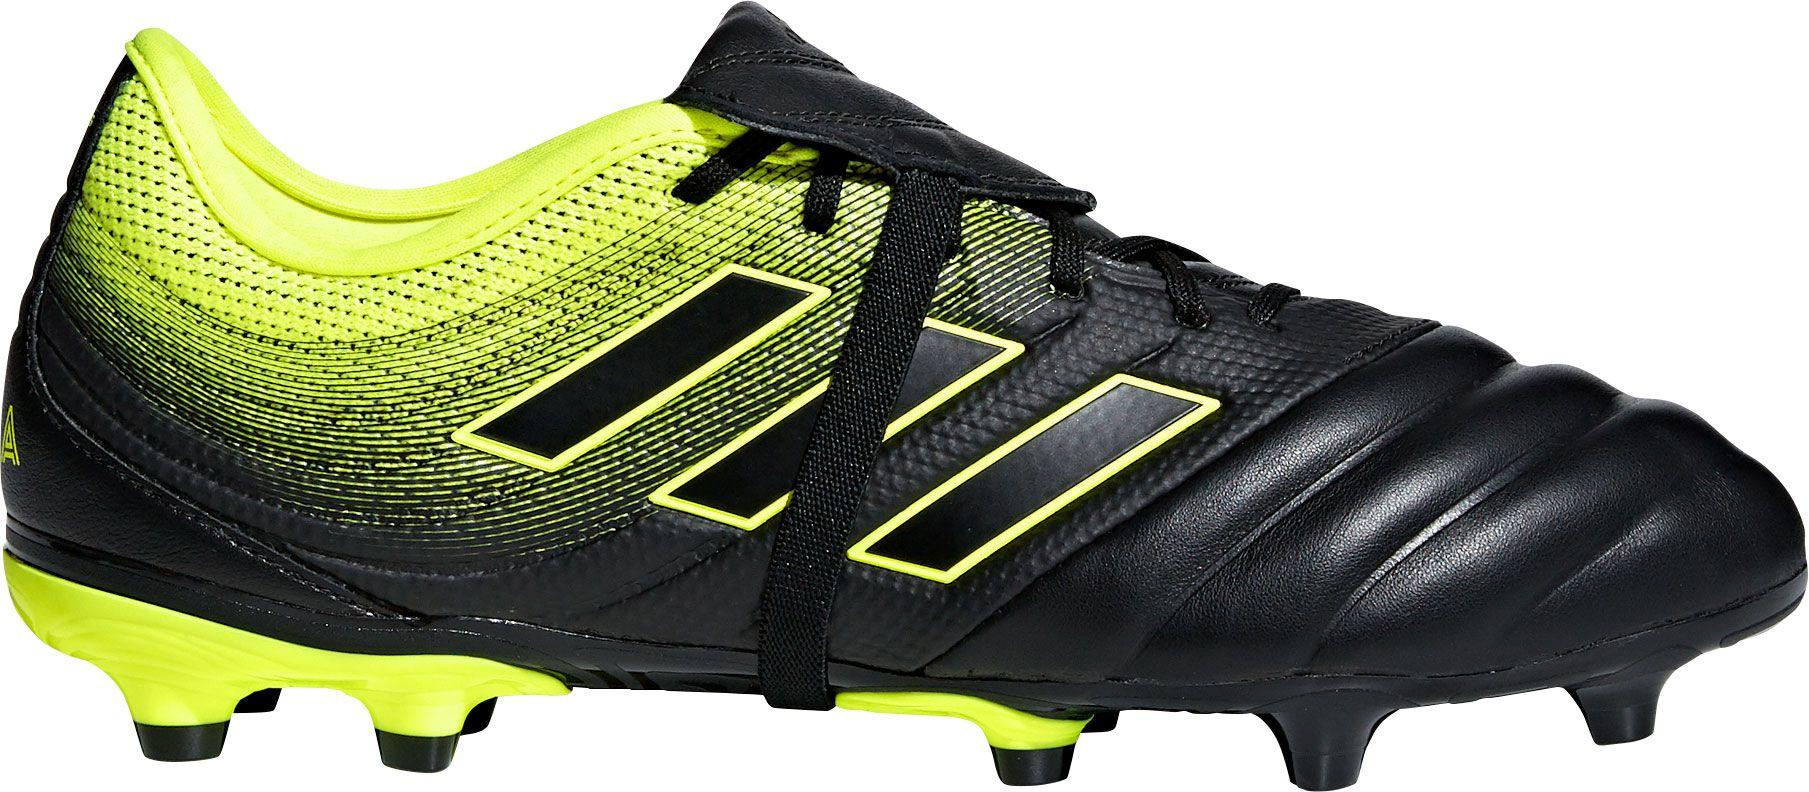 adidas Men's Copa Gloro 19.2 FG Soccer Cleats, Size: 7.5, Black